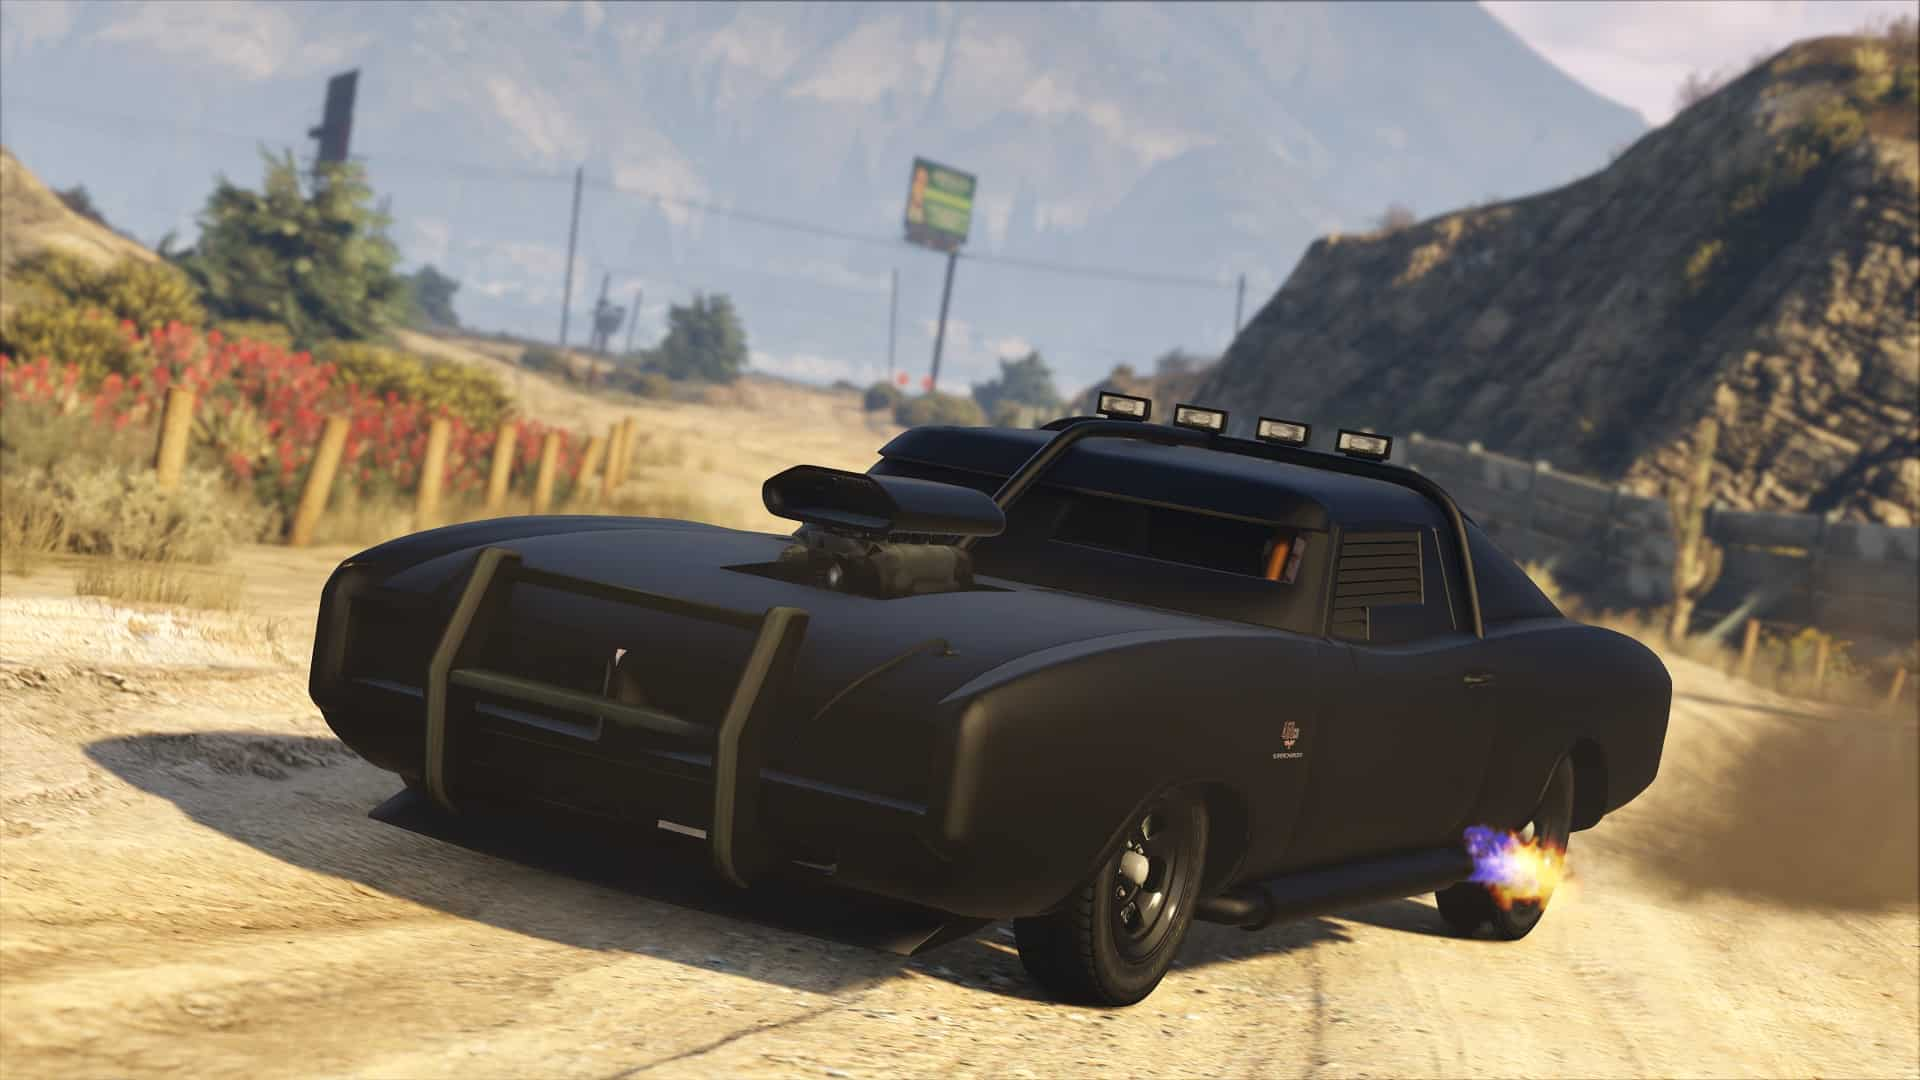 Best GTA 5 Cheats - Vehicle Cheats